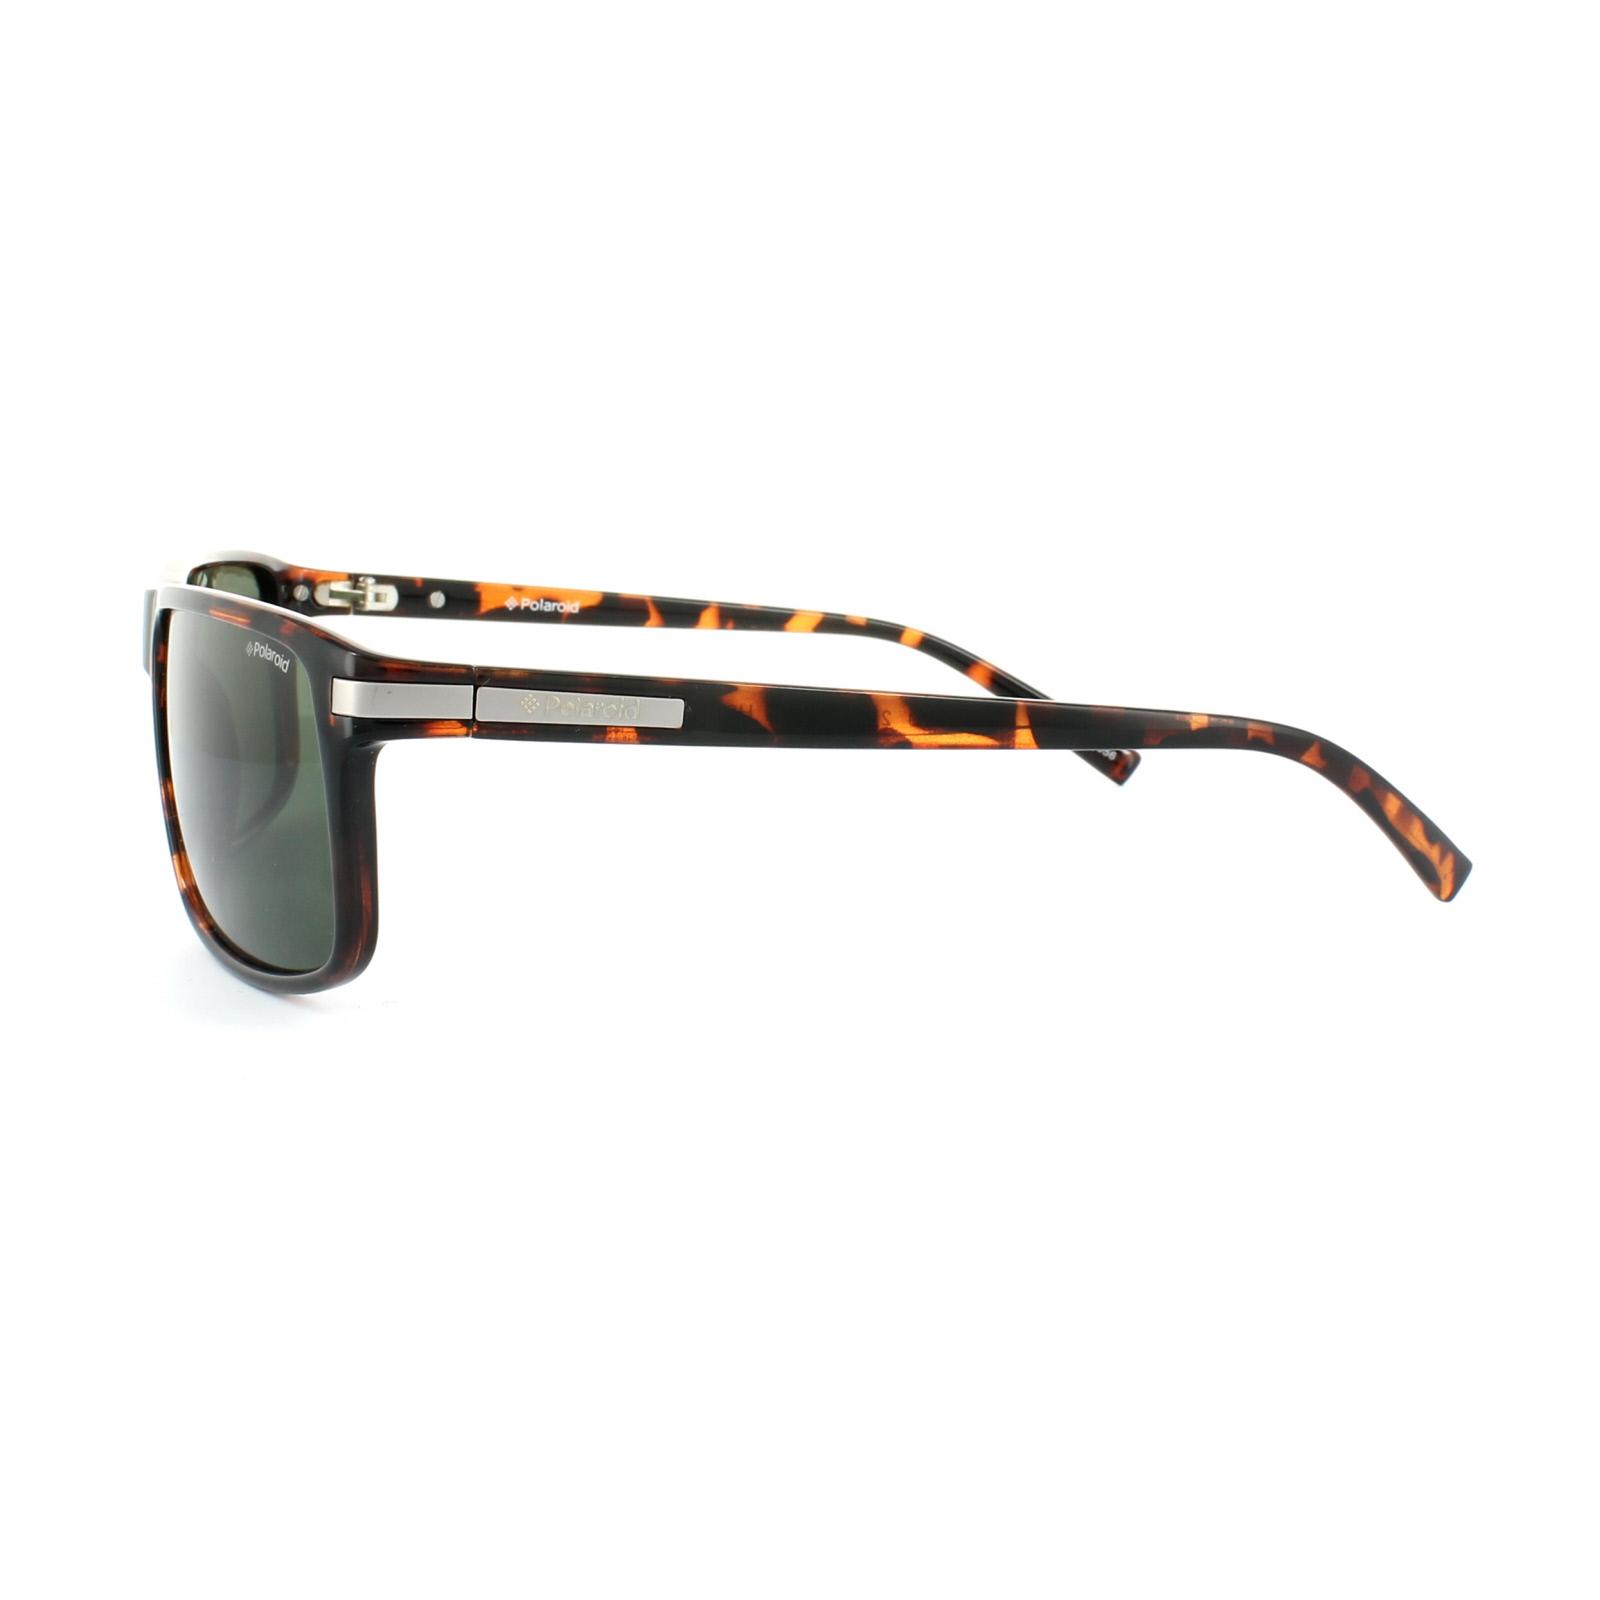 Cheap Polaroid 2019 S Sunglasses Discounted Sunglasses